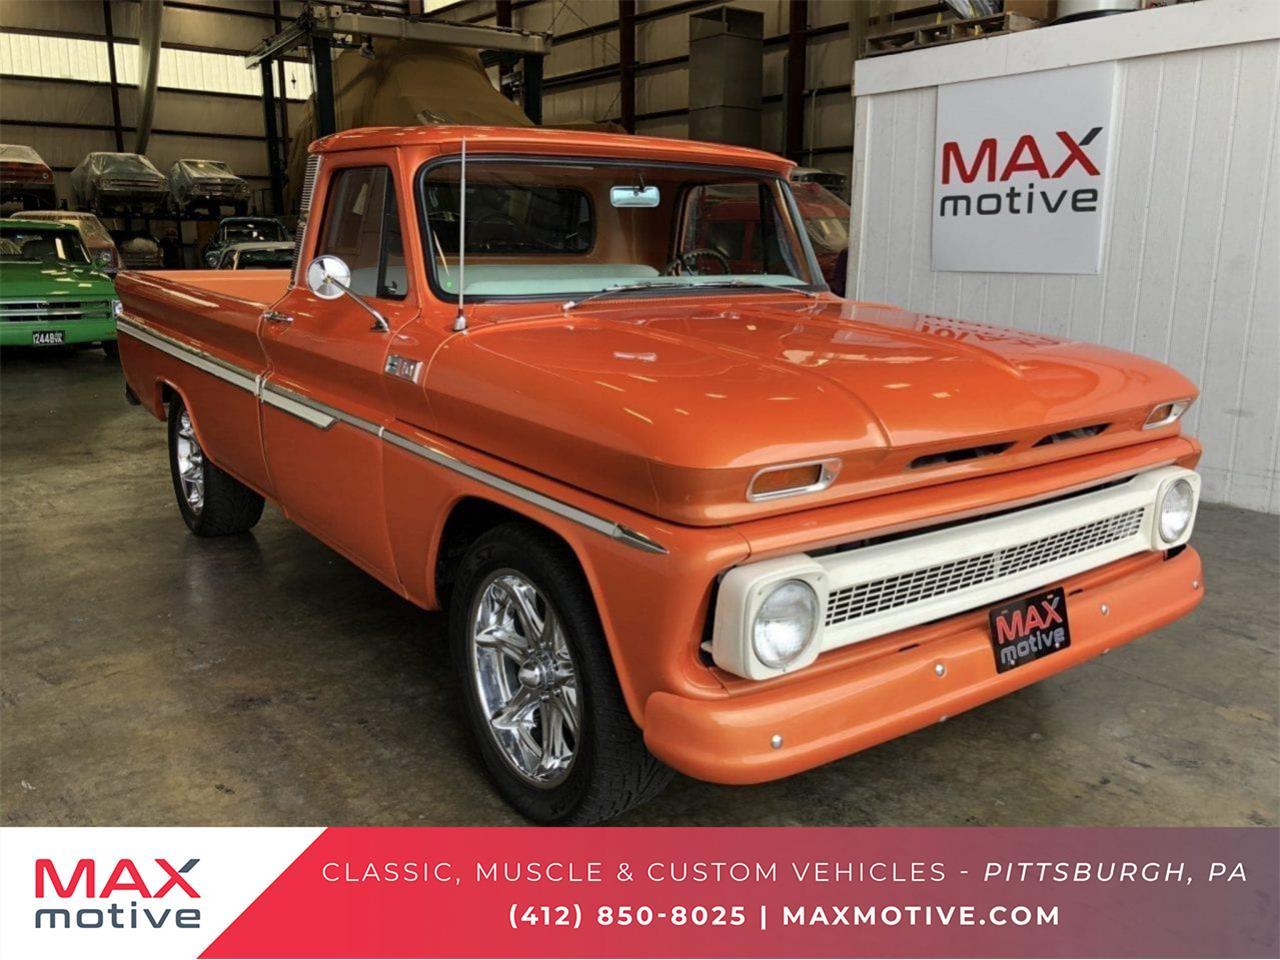 1965 Chevrolet C10 For Sale Classiccars Com Cc 1182996